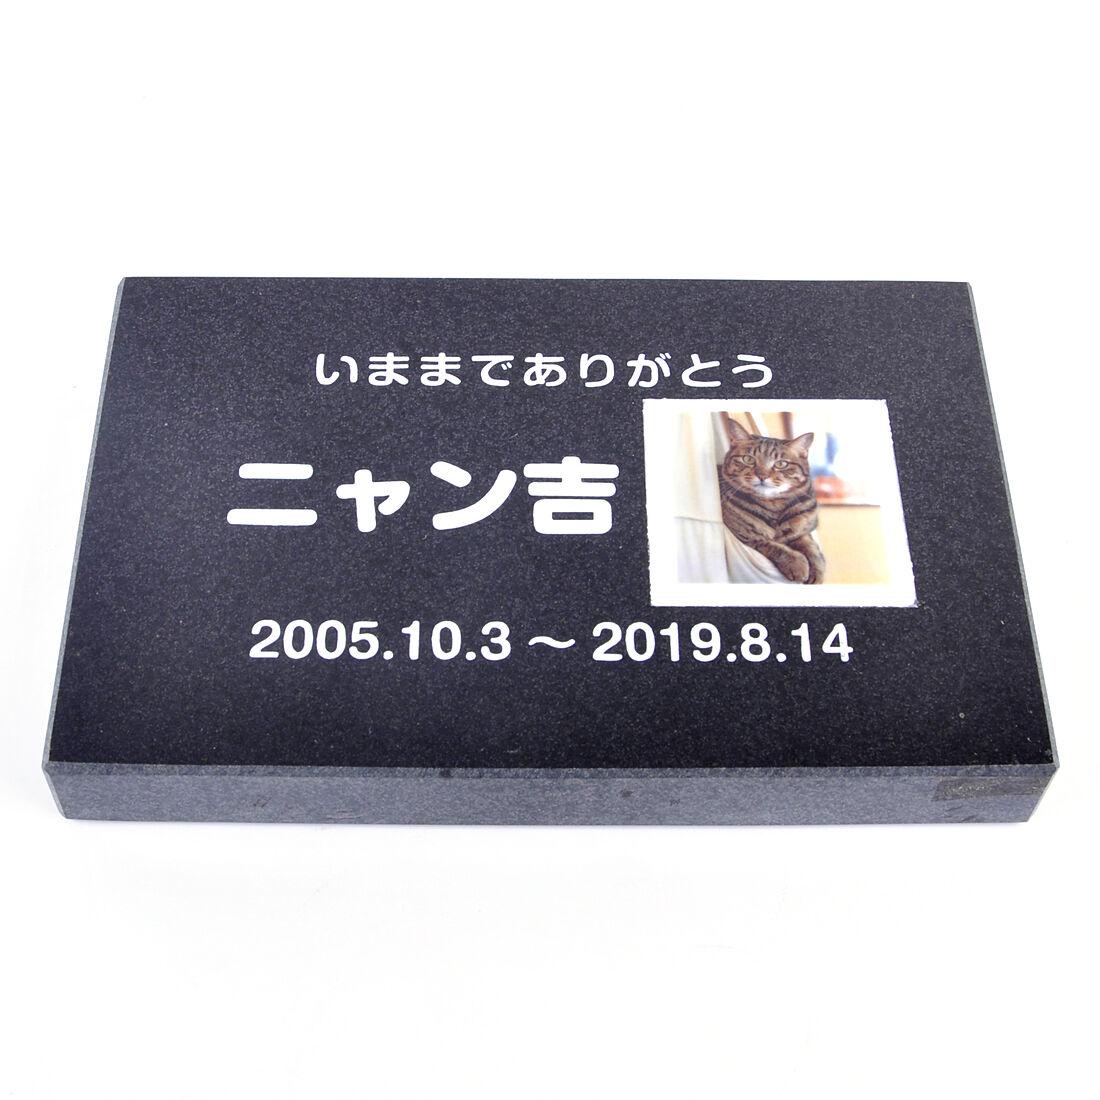 Pet&Love. ペットのお墓 天然石製 シンプル型 遺影付きタイプ 御影石 ブラック  200x130mm(厚さ20mm) 正方形写真タイプ(お客様の写真を印刷)猫モデル 【HLS_DU】【_名入れ】 attr168attr ctgr2ctgr sml3sml+ctgr2ctgr noanml